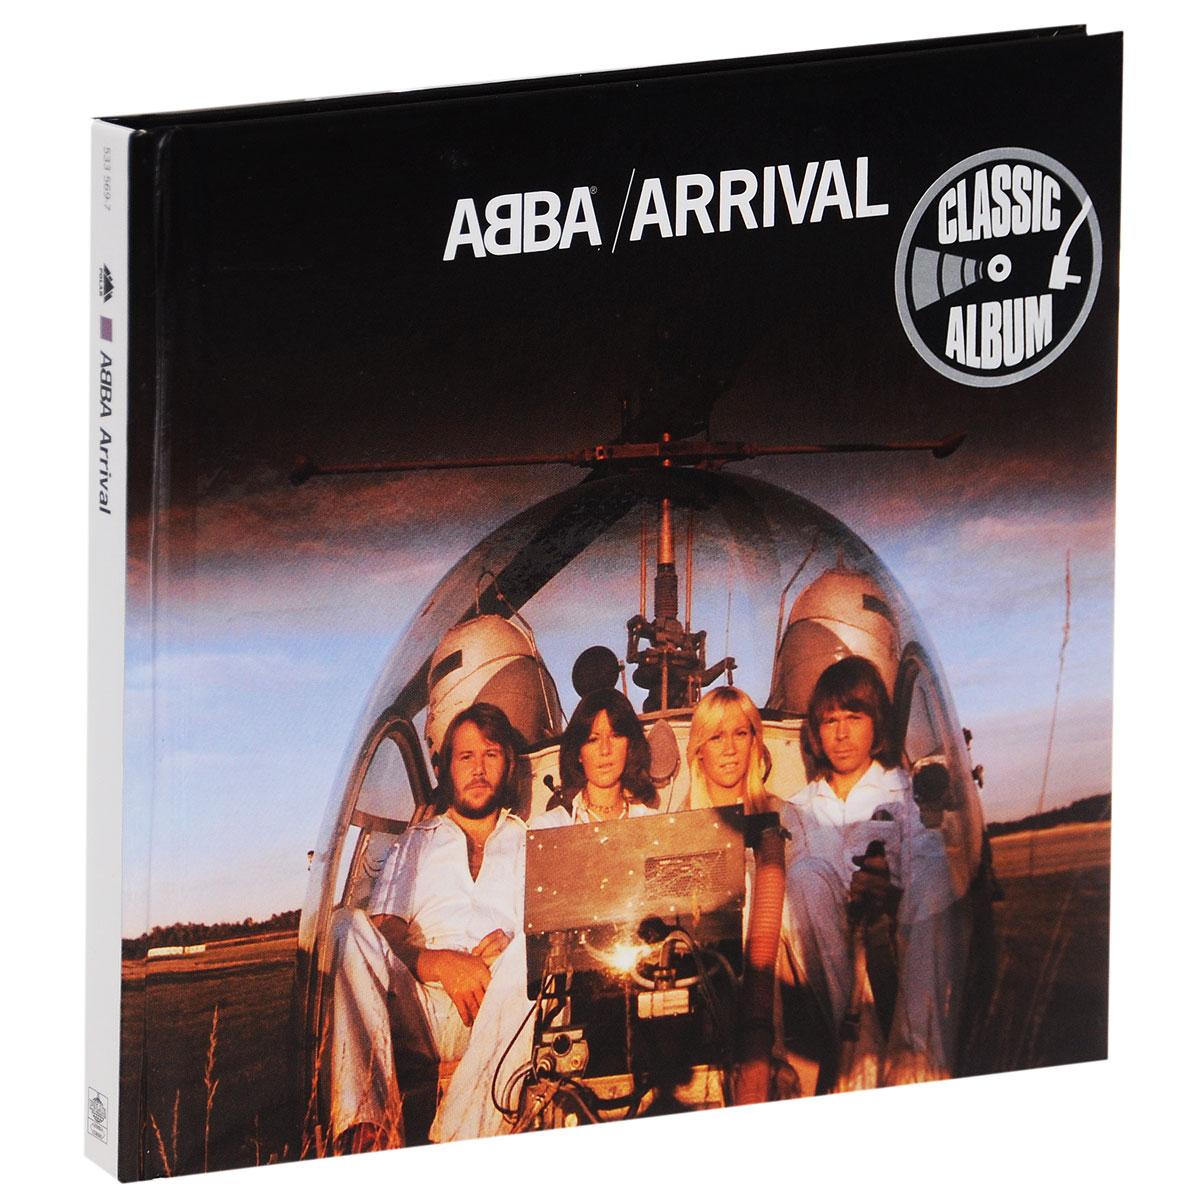 ABBA. Arrival 2011 Audio CD